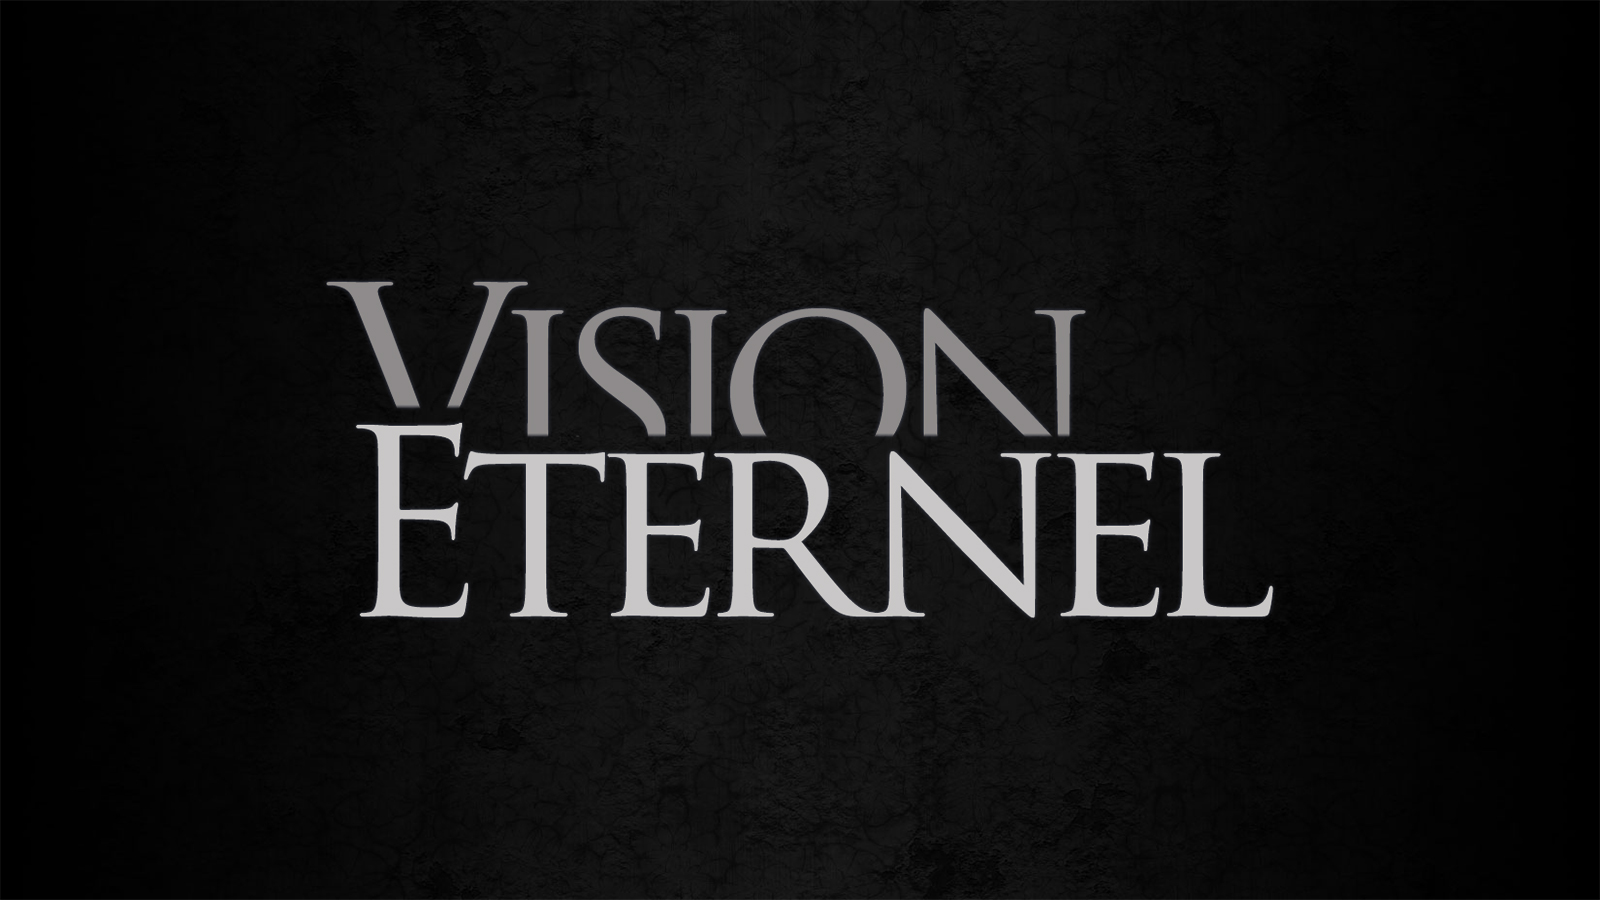 Vision Éternel Interviews Series On The Abridged Pause Blog